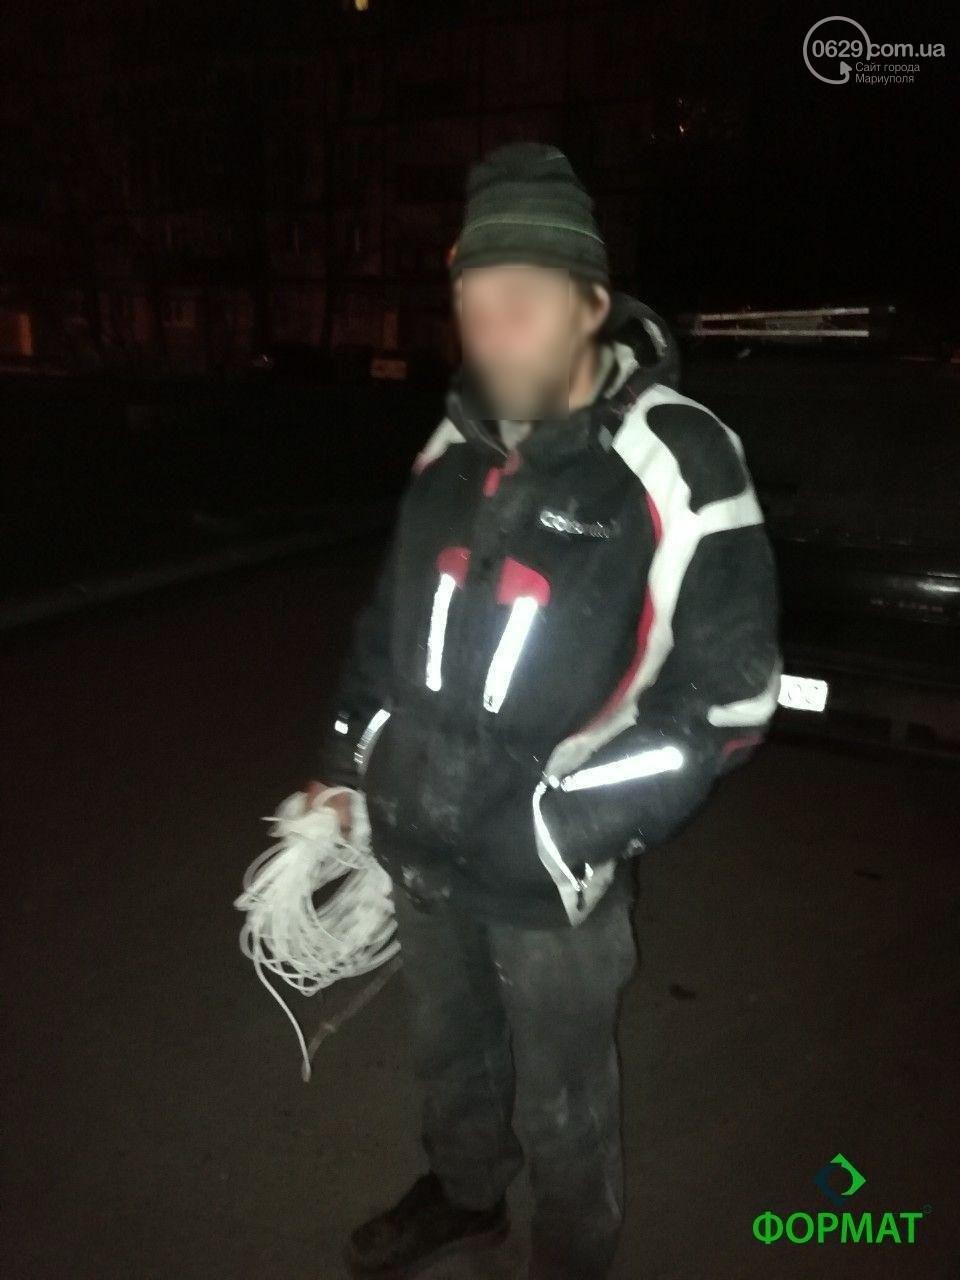 В Мариуполе словили мужчину, подозреваемого в краже кабеля (фото)